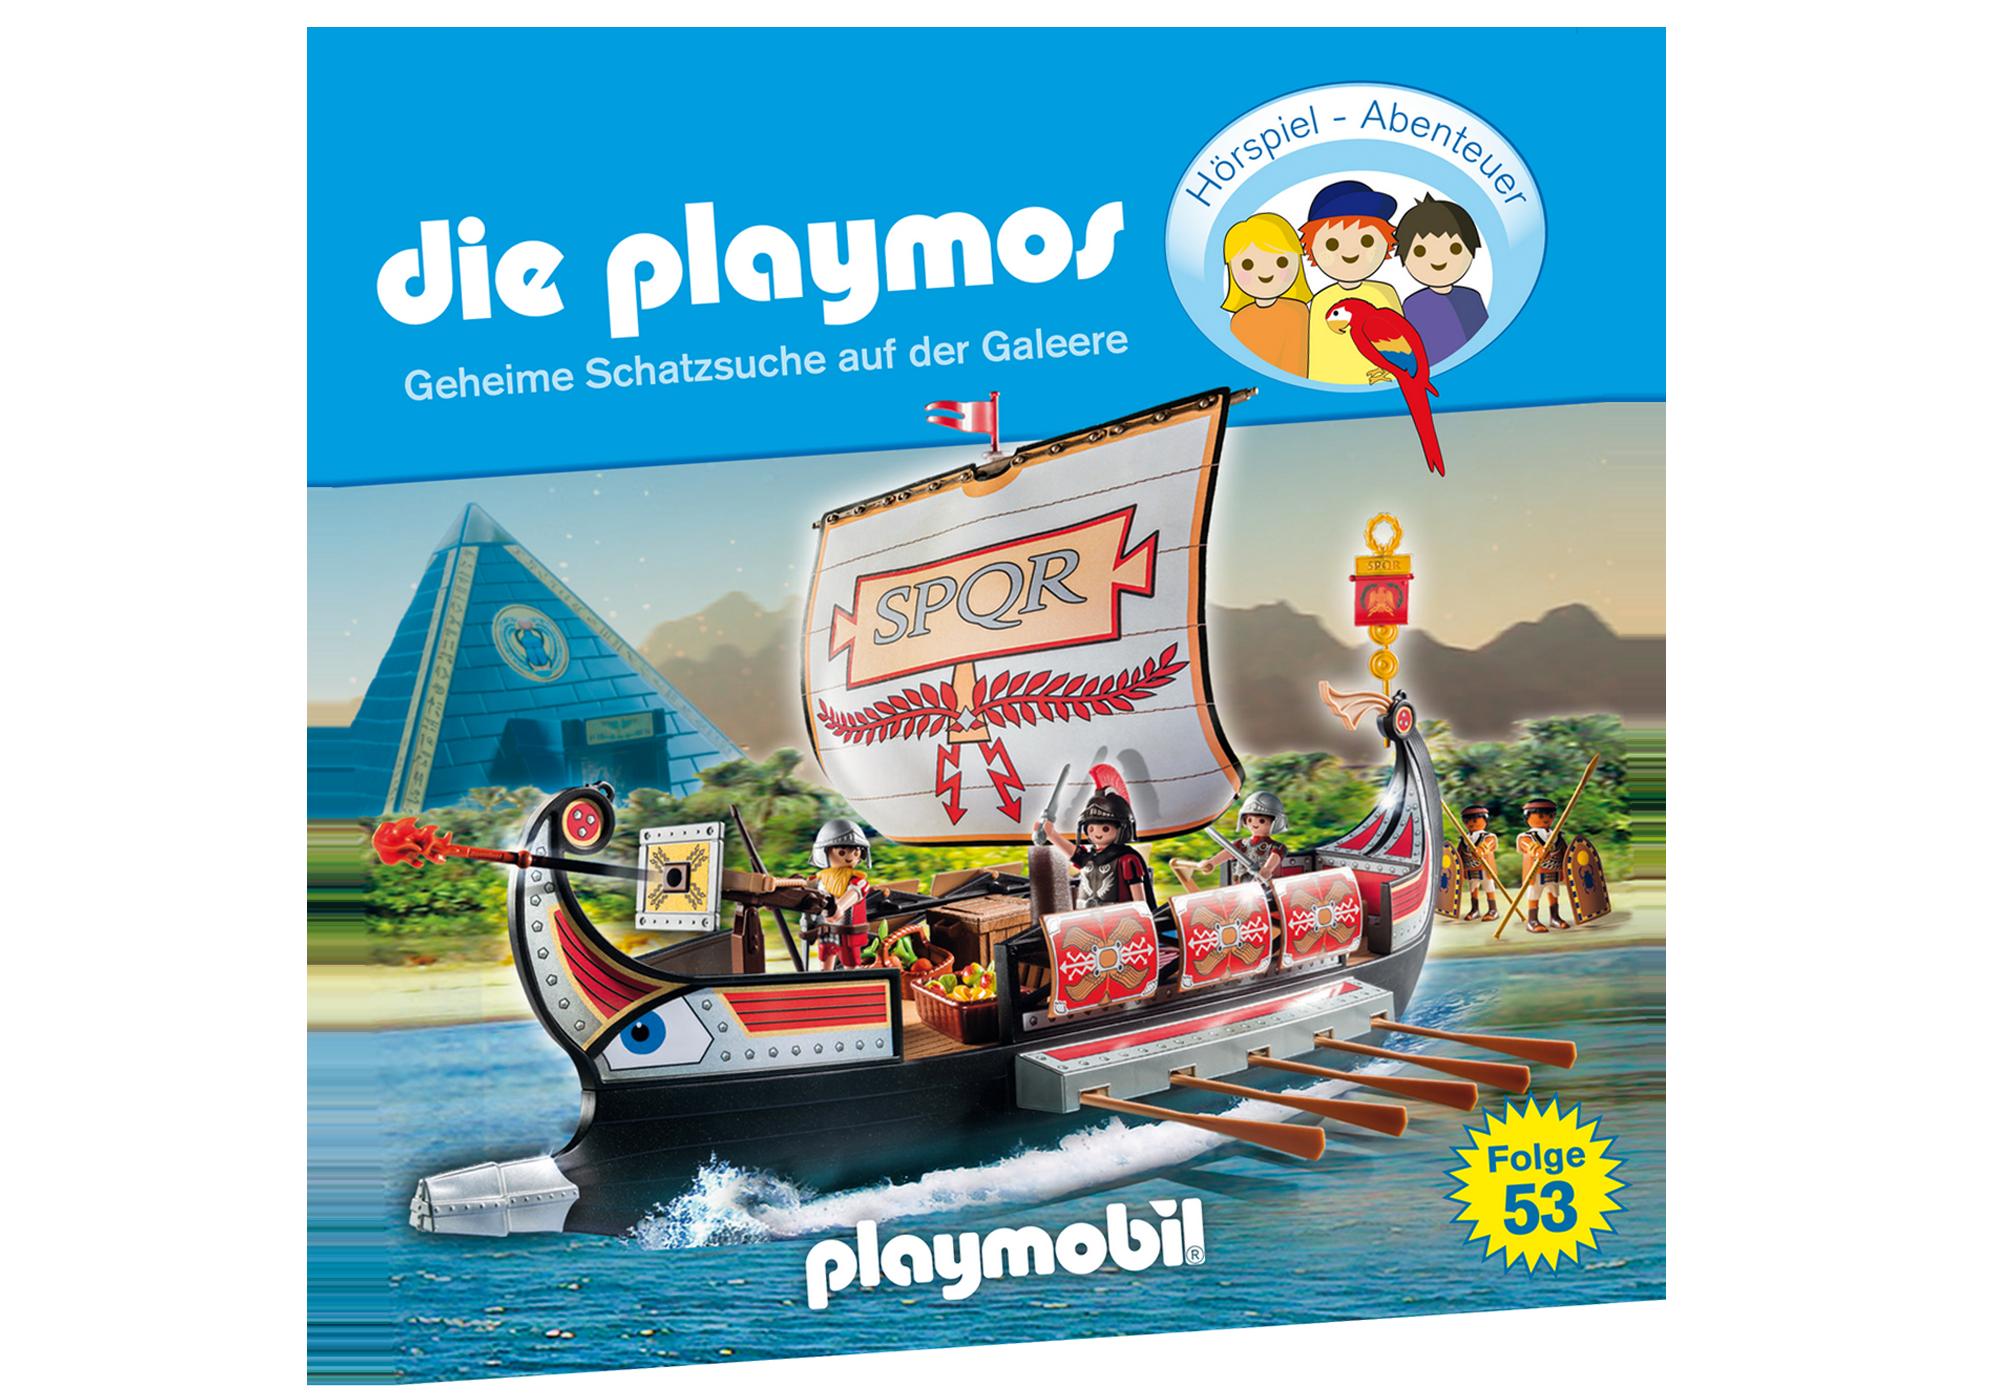 http://media.playmobil.com/i/playmobil/80482_product_detail